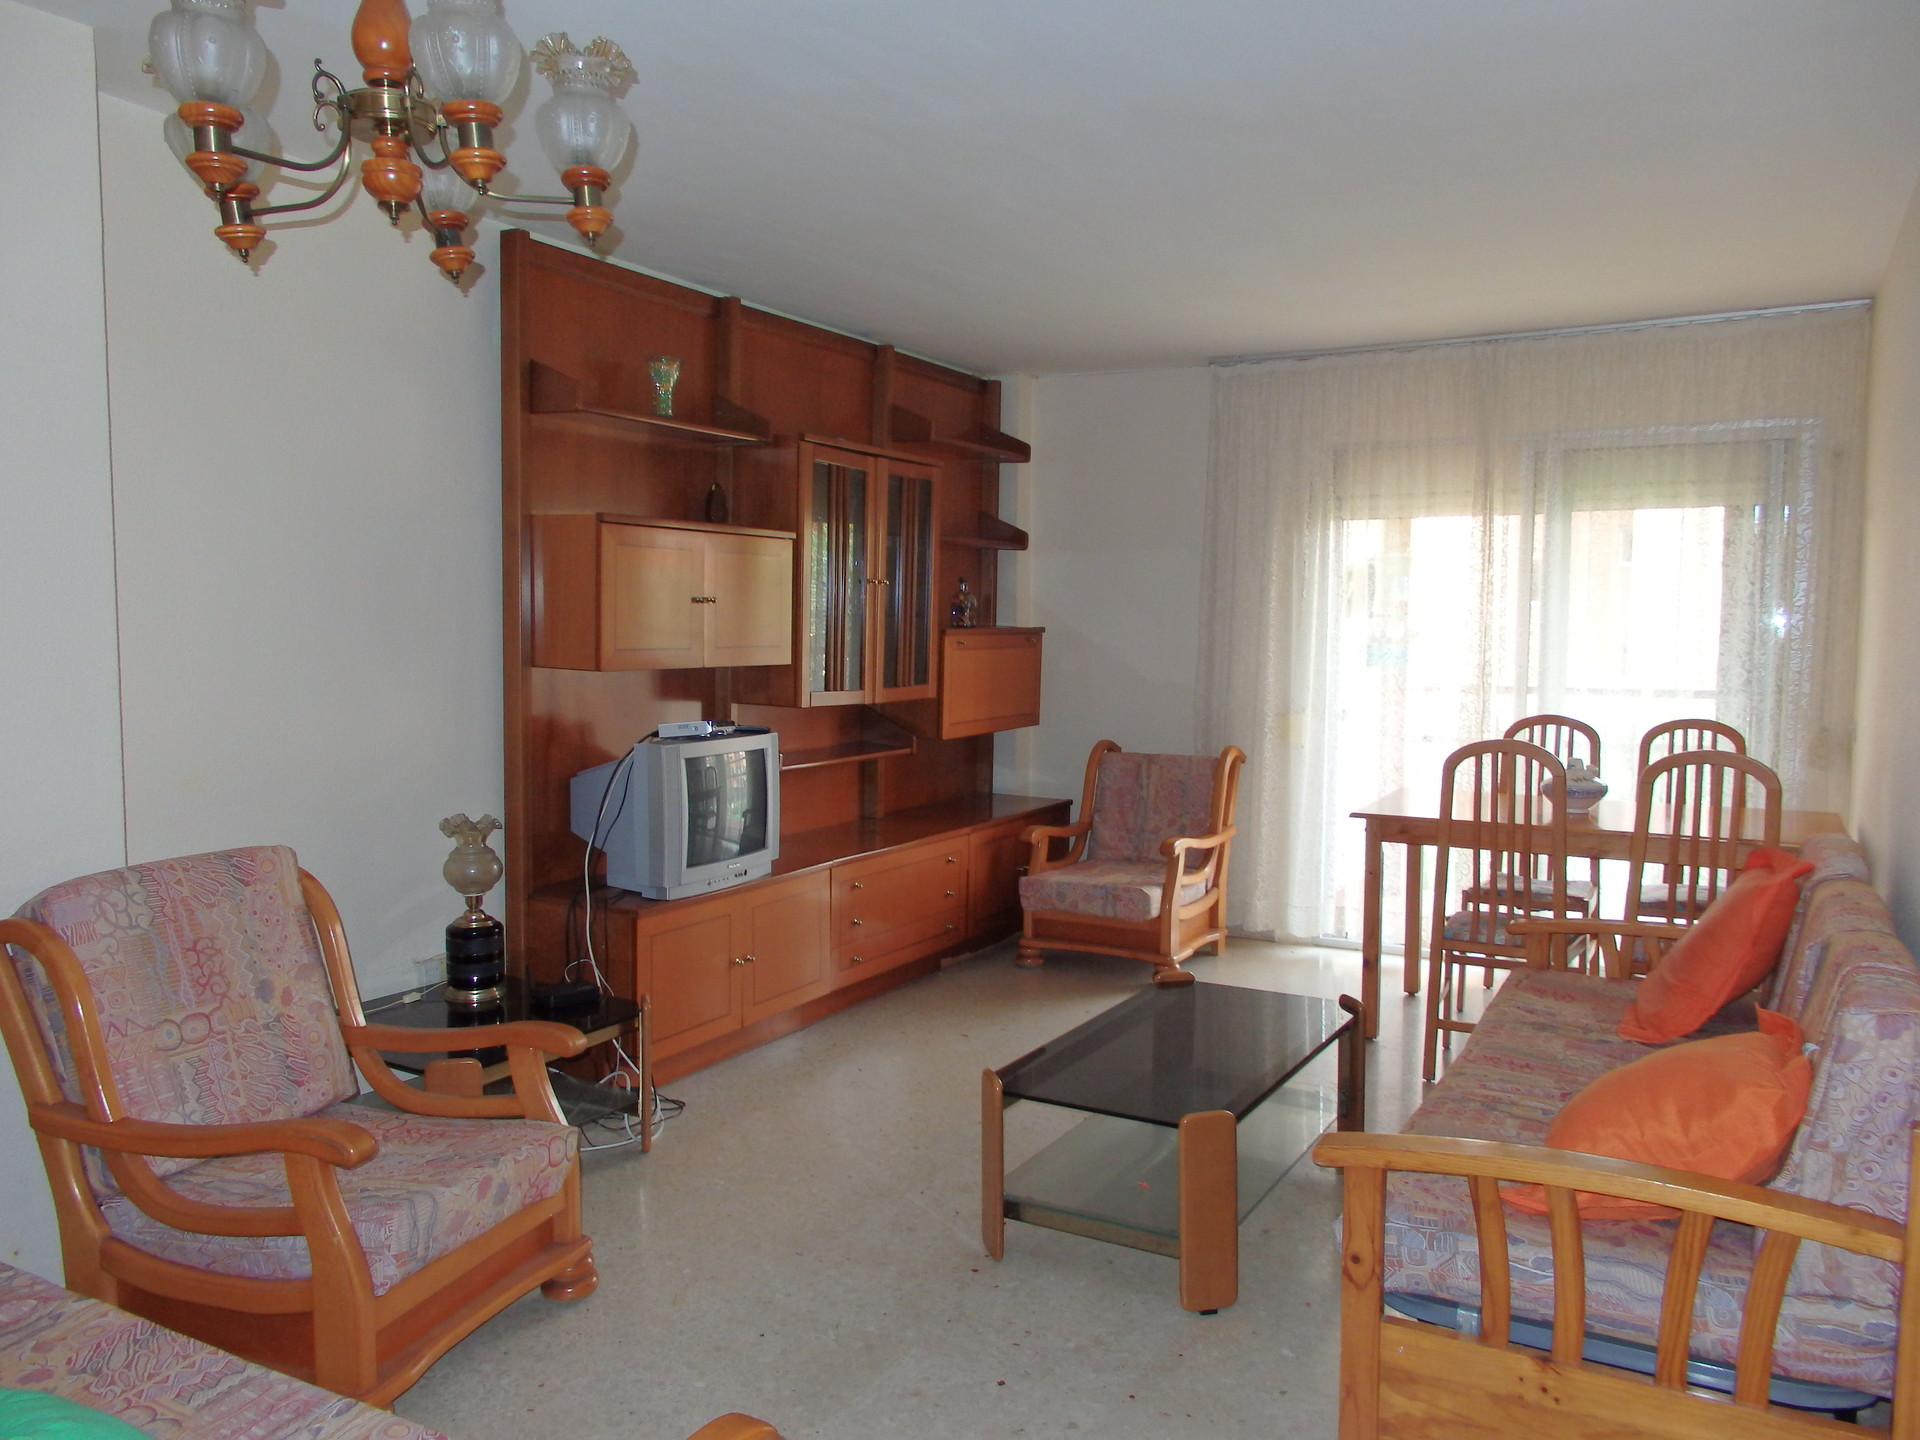 Benalm dena m laga habitaci n en piso compartido Alquiler de habitacion en piso compartido